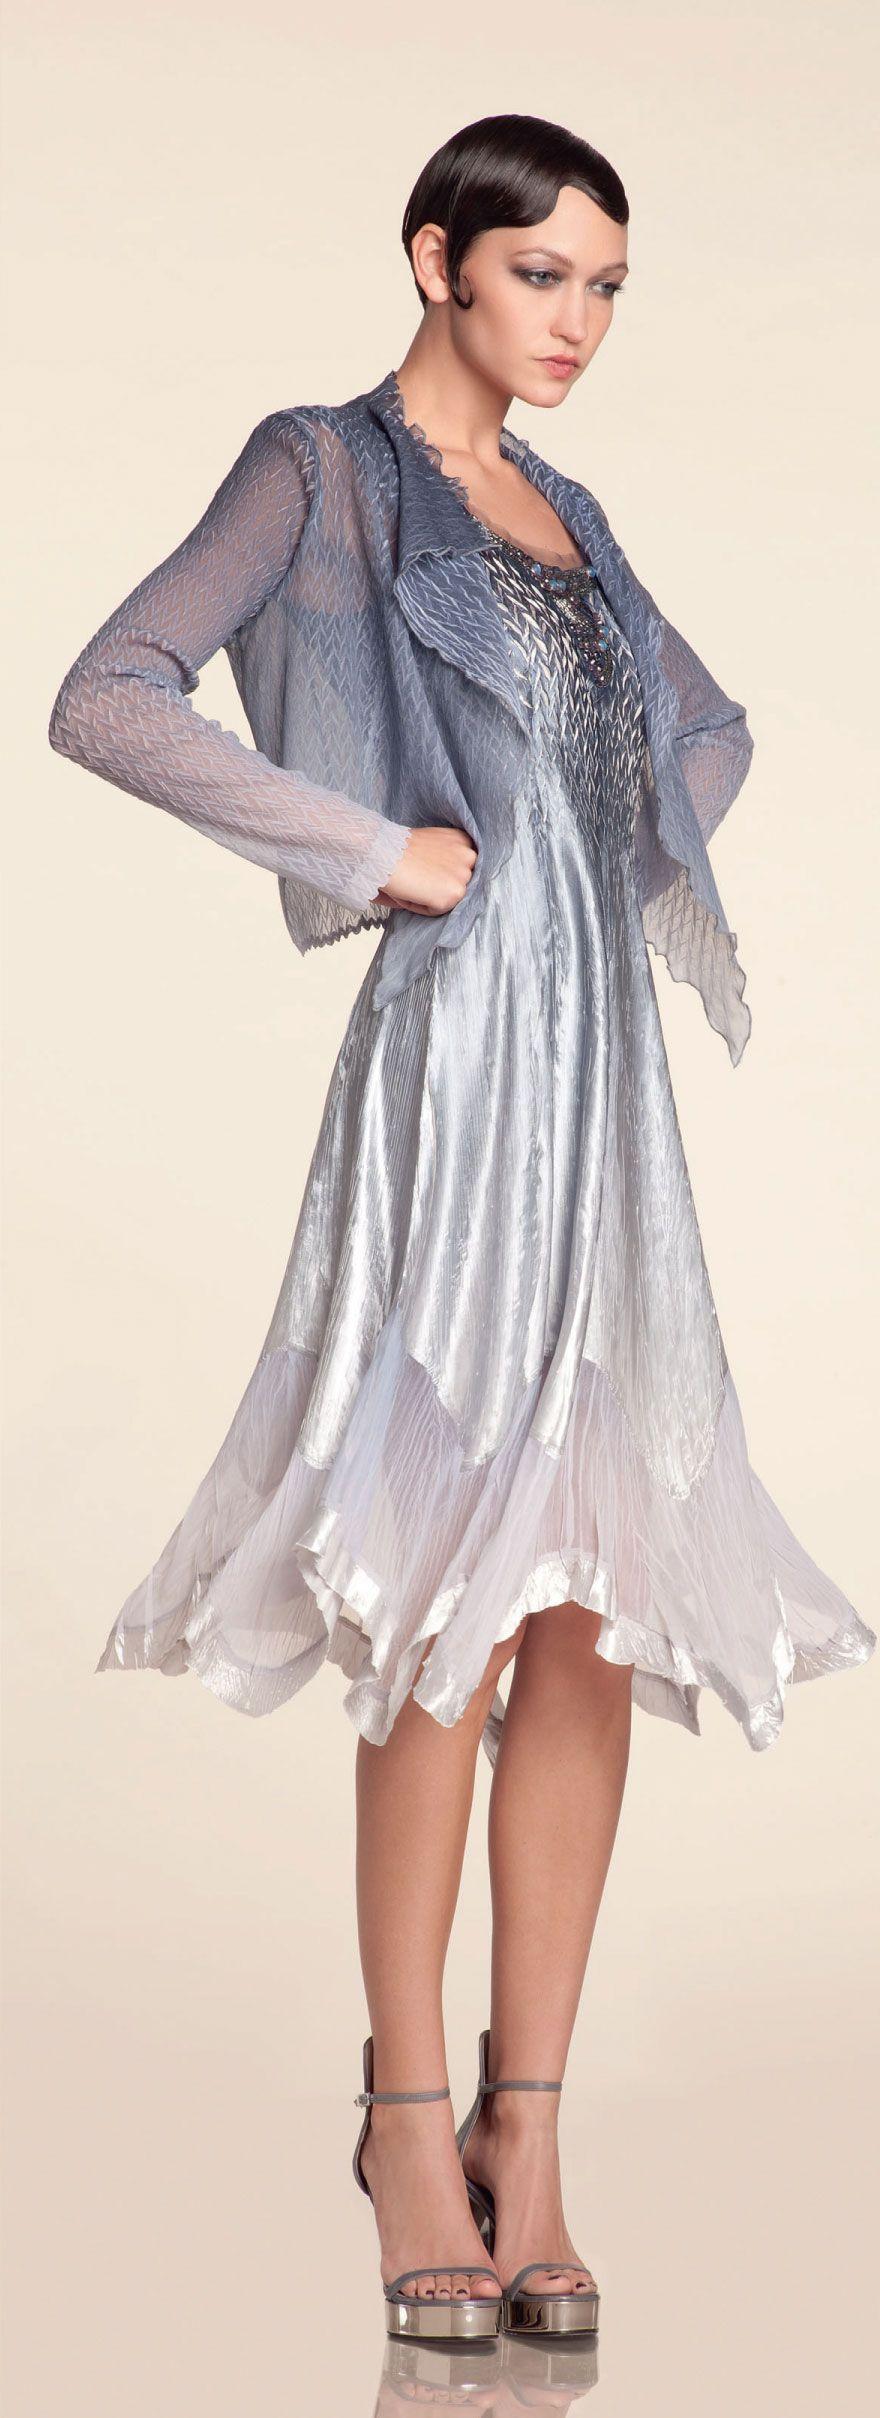 Großartig Komarov Dresses Wedding Ideen - Brautkleider Ideen ...